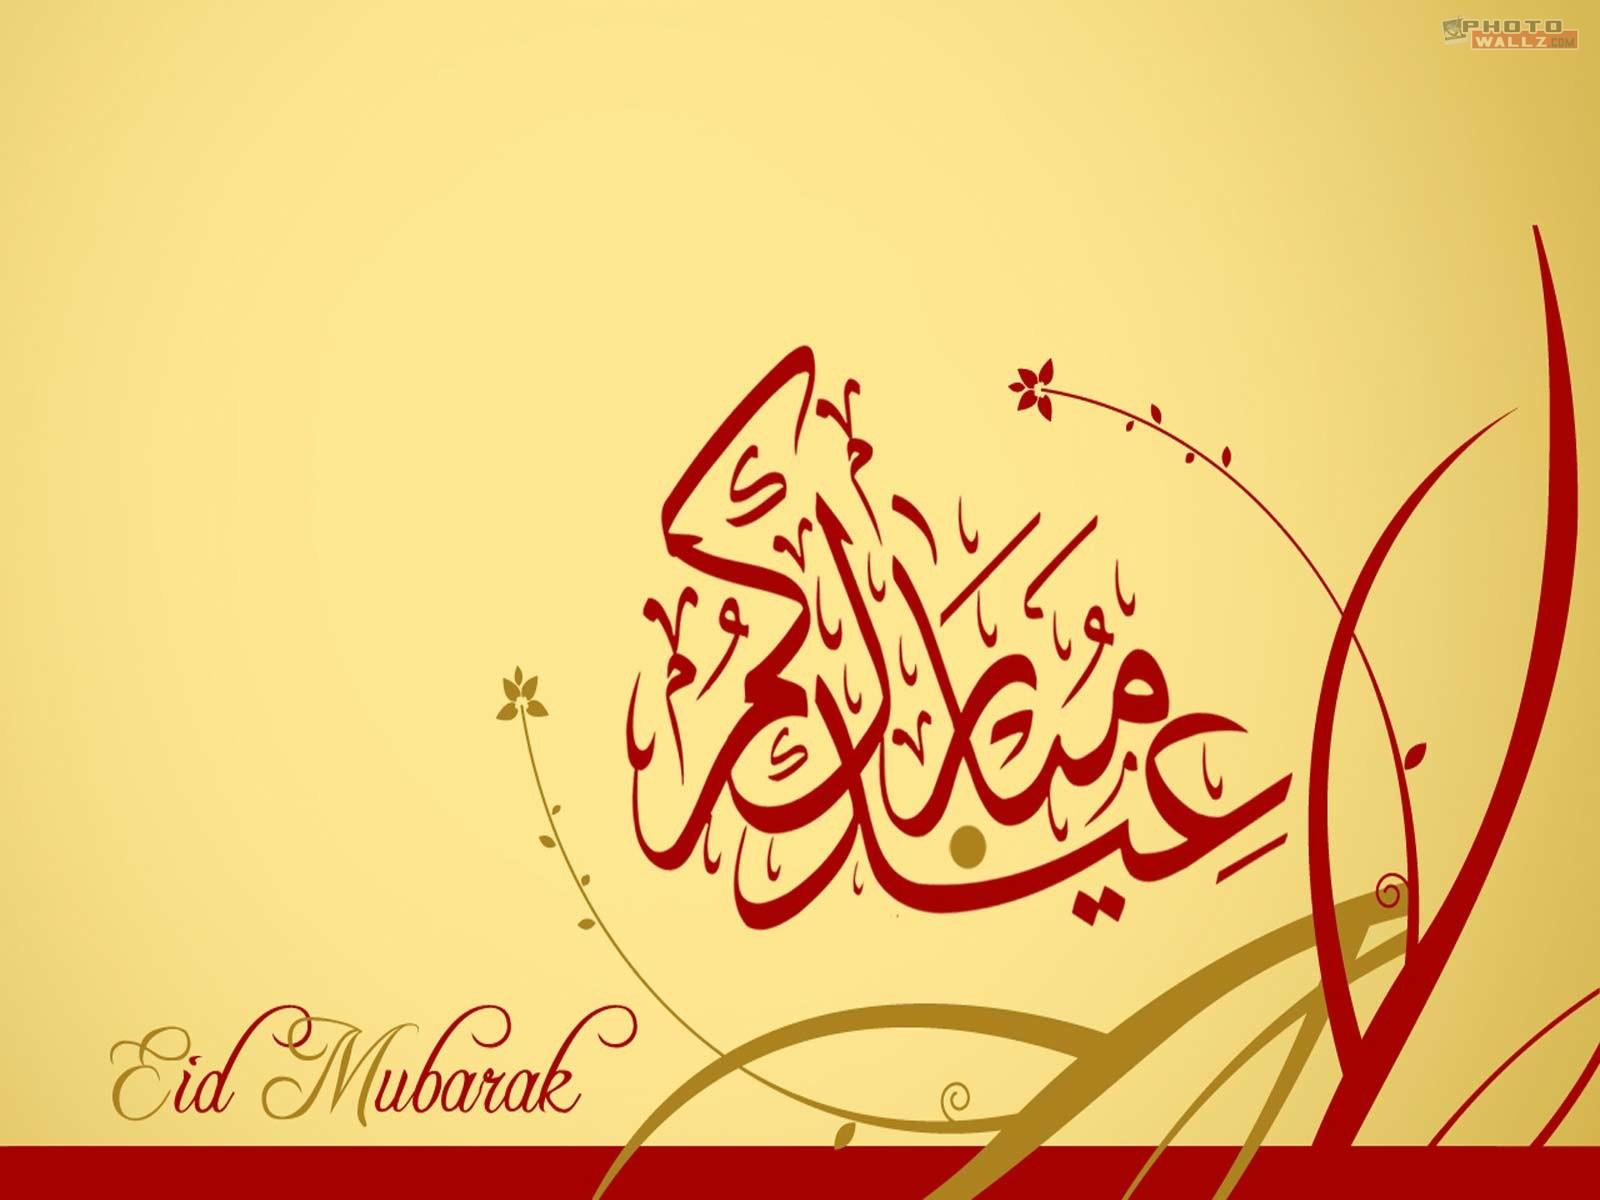 http://4.bp.blogspot.com/-f8xQcFaVrAo/UCiTdG1fjOI/AAAAAAAAAd0/MeVtLvEdxu0/s1600/eid-mubarak-in-arabic-wallpapers-67.jpg